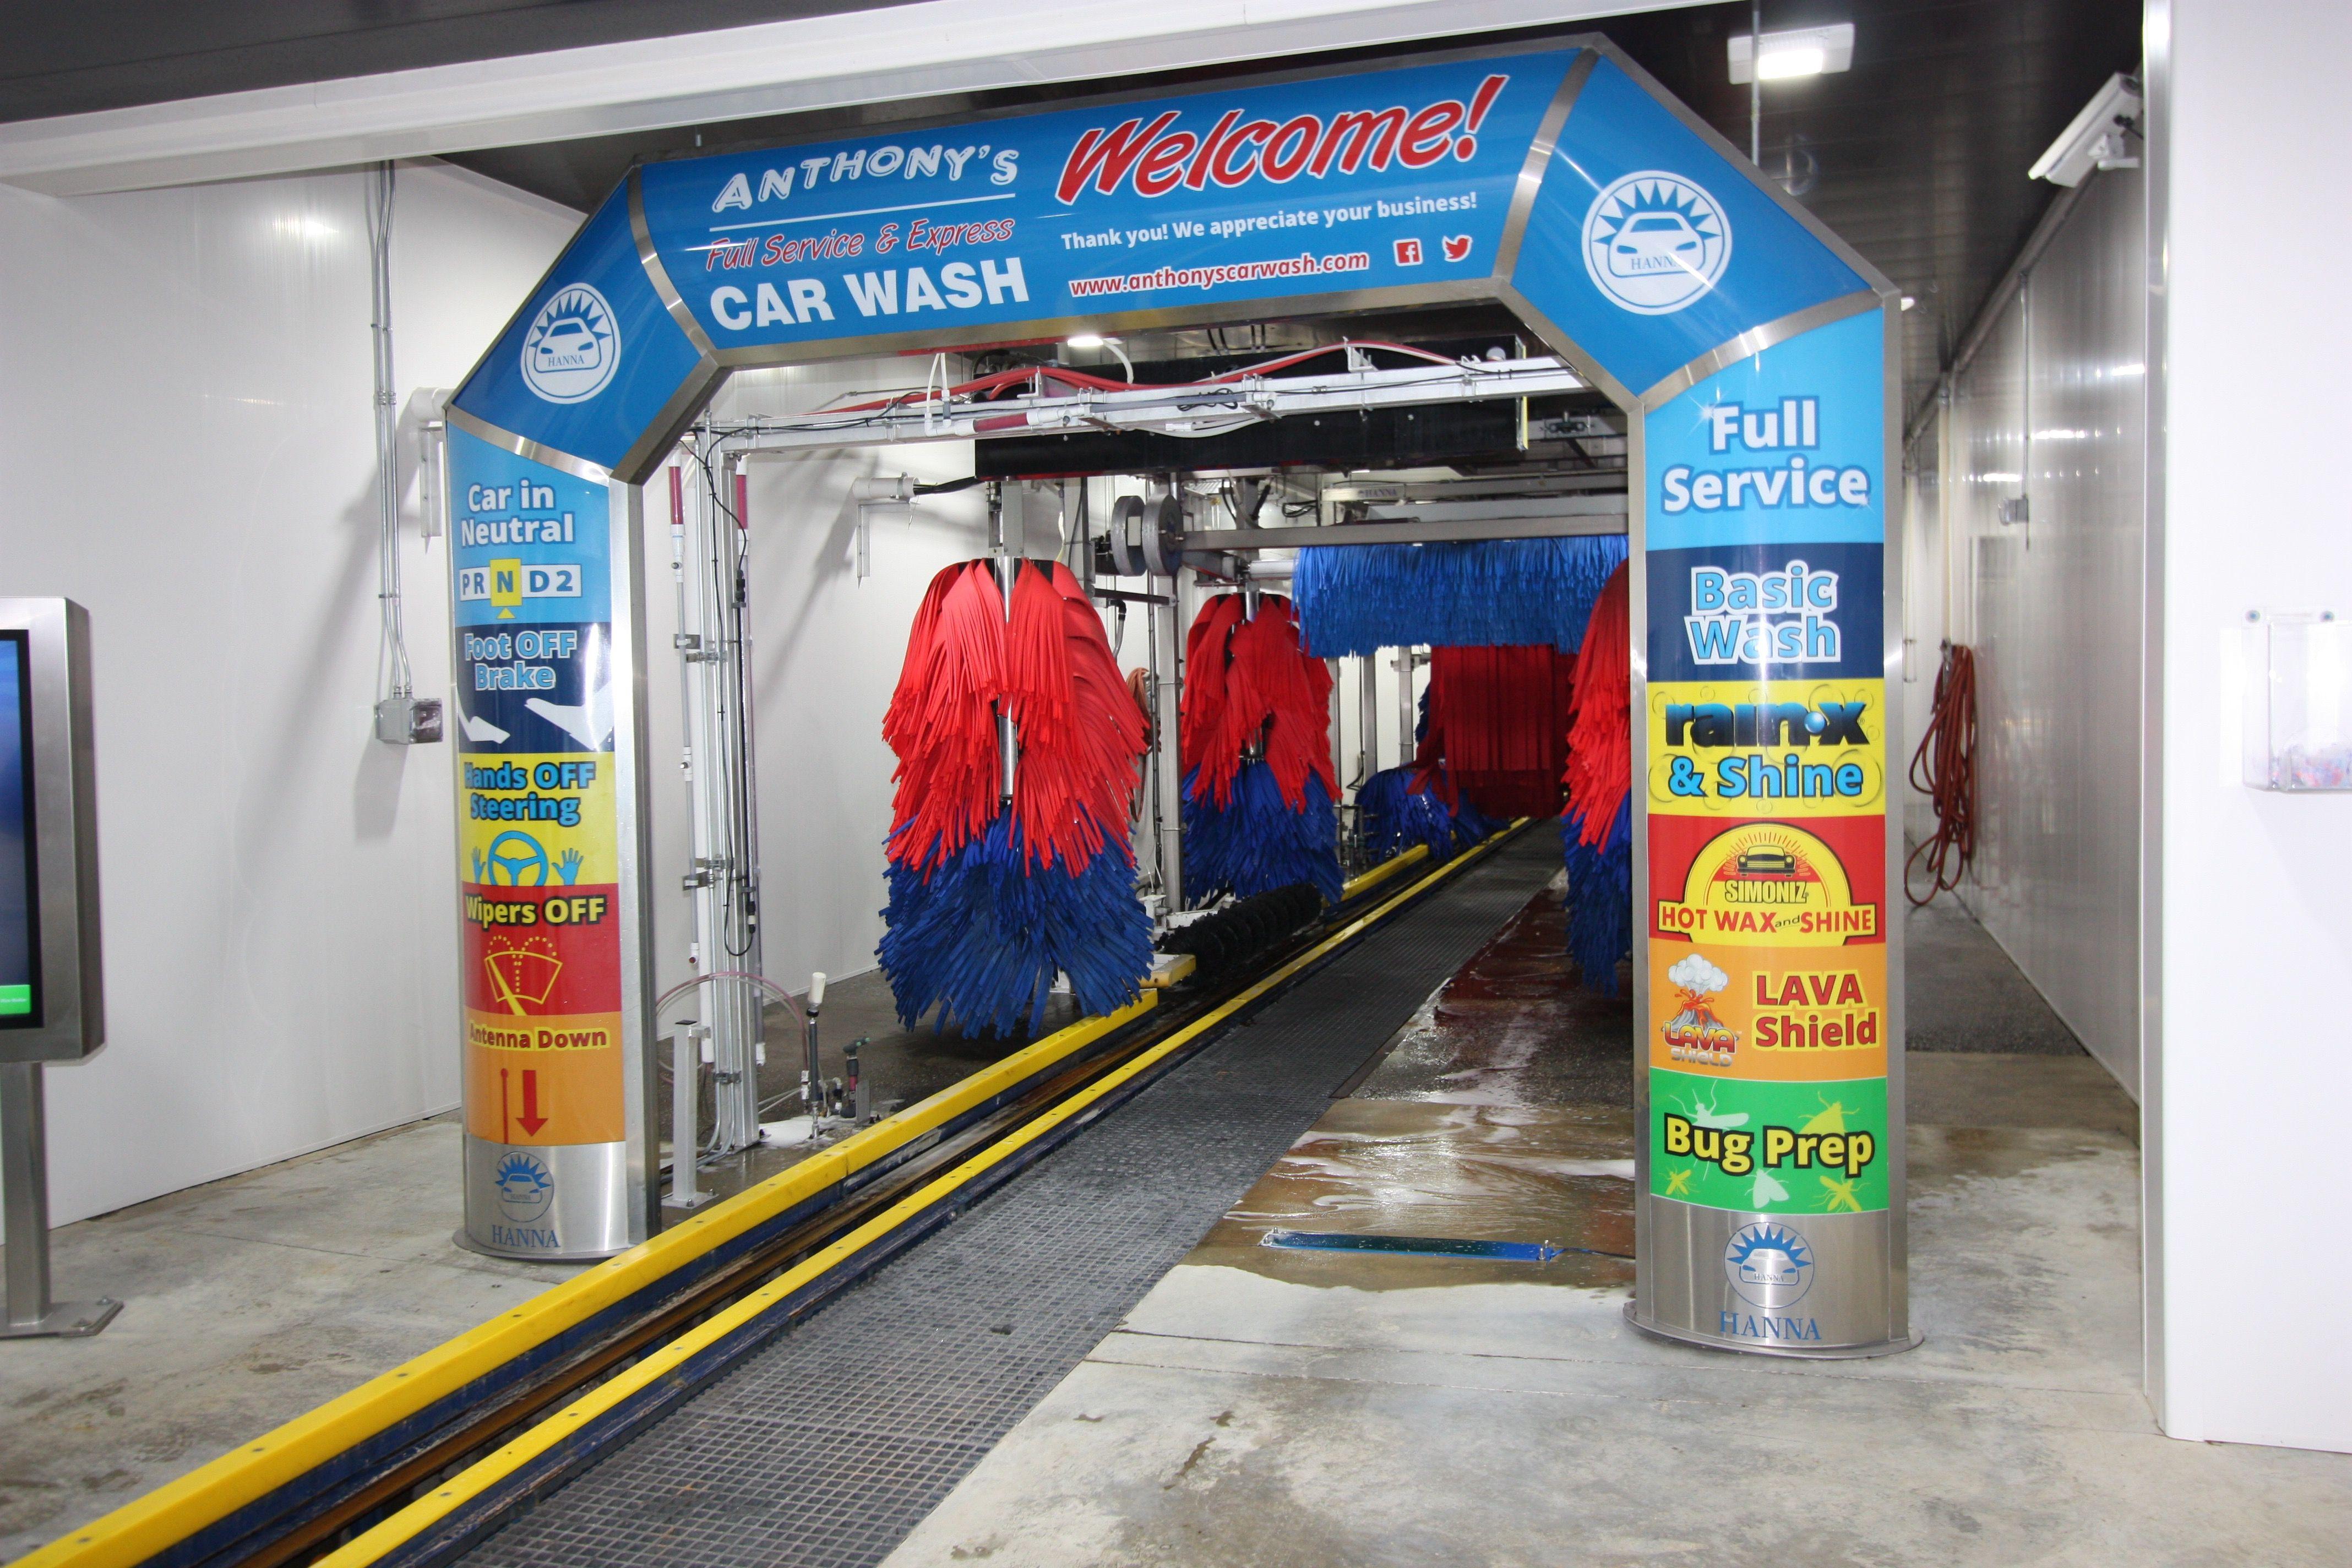 Car Wash Locations Photos Coleman Hanna Carwash Systems Drive Through Car Wash Car Wash Sports Cars Luxury